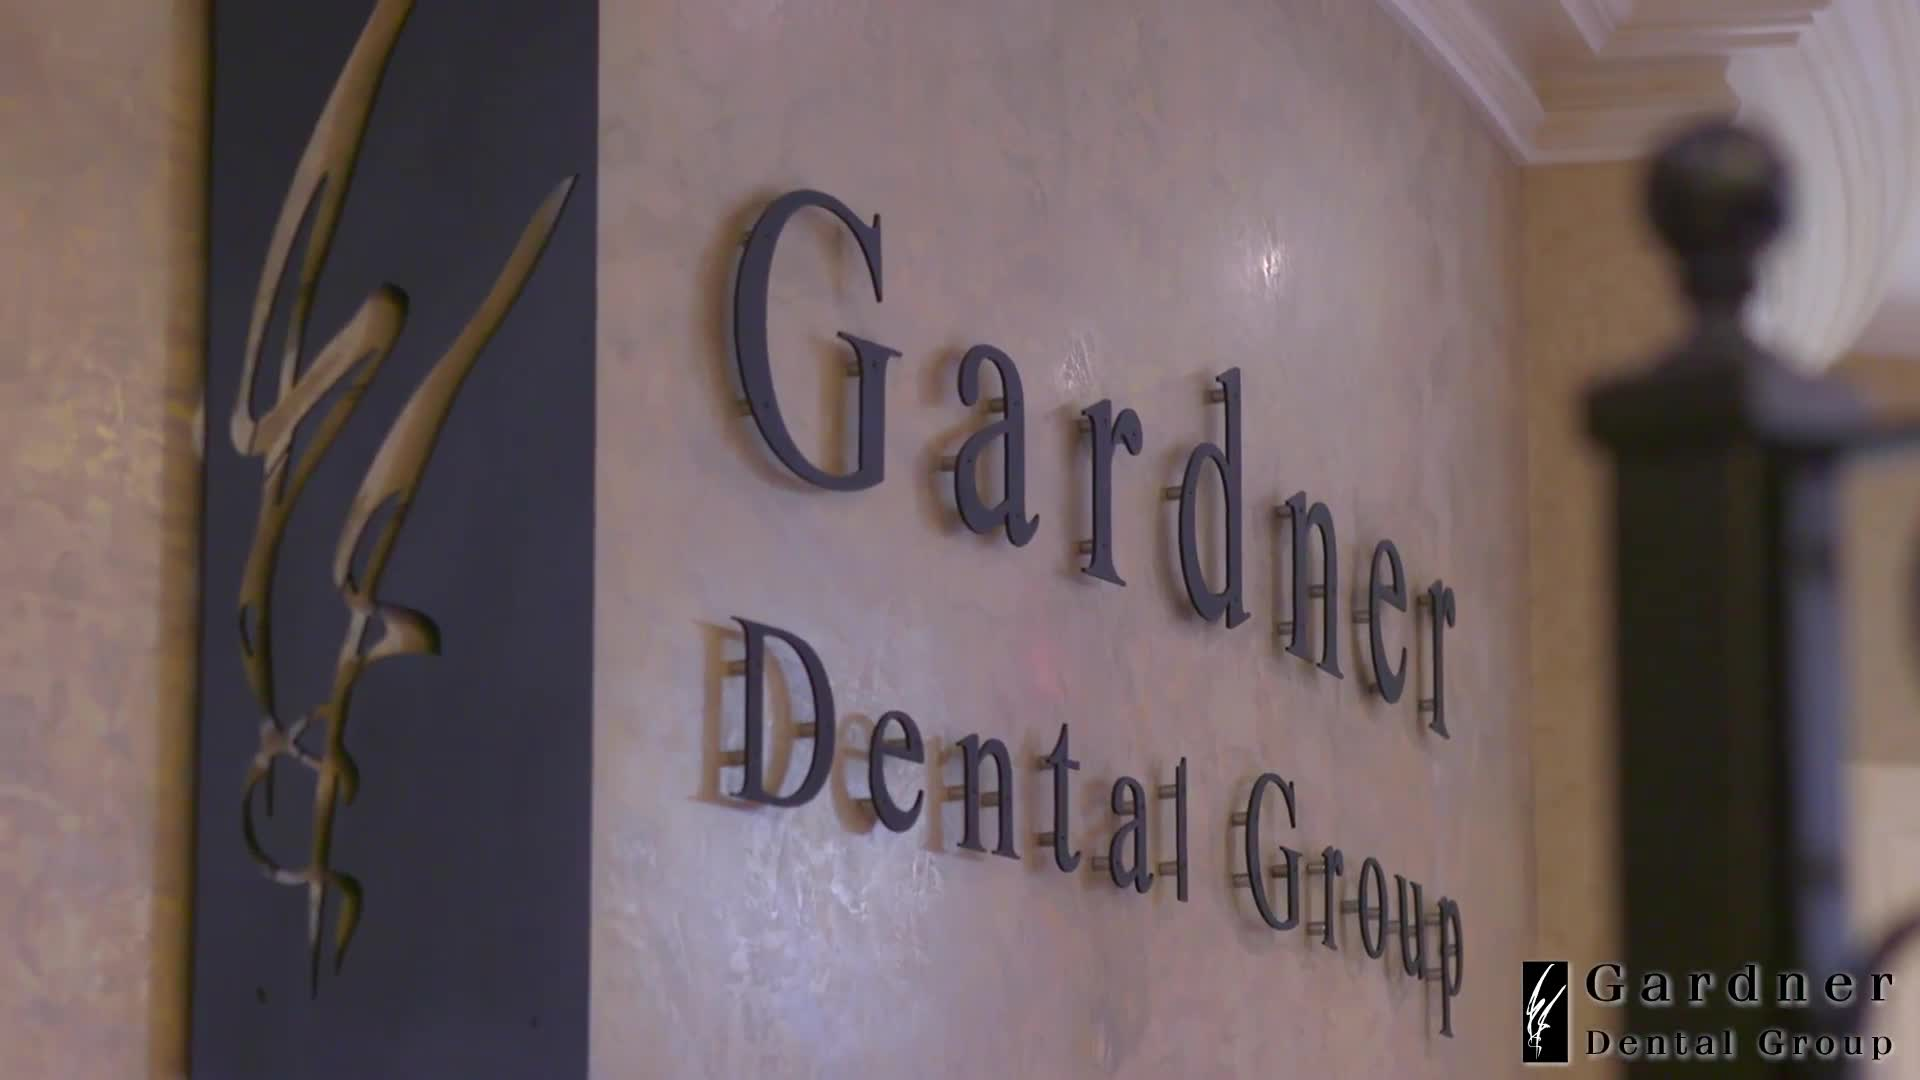 Gardner Dental Group - Teeth Whitening Services - 9056323633